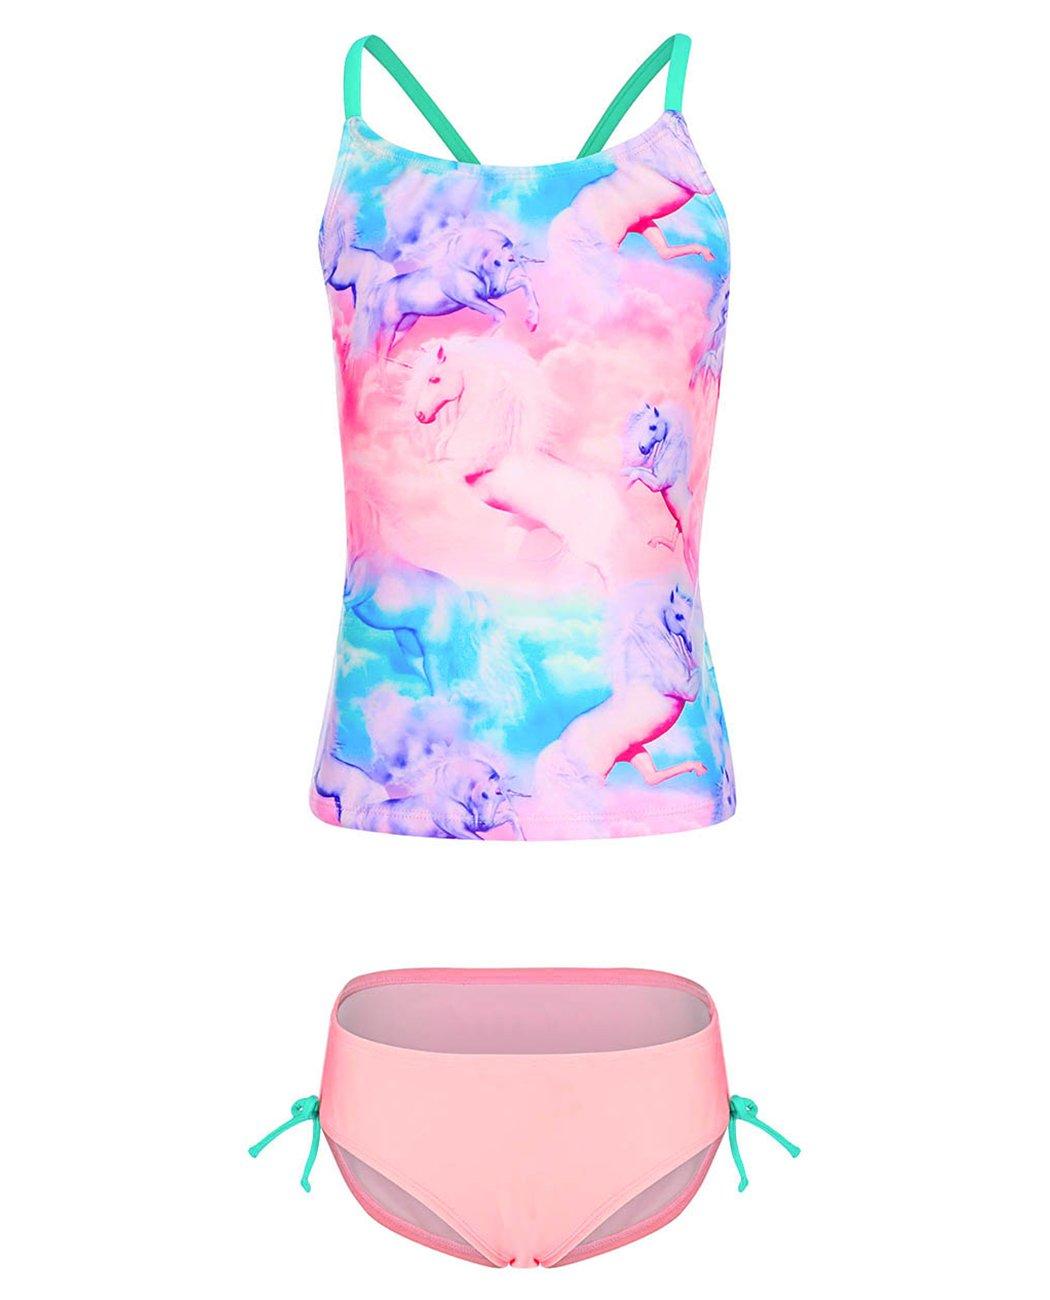 iDrawl Girls Two Piece Swimwear, Racerback Beach Swimming Bathing Suits by iDrawl (Image #1)